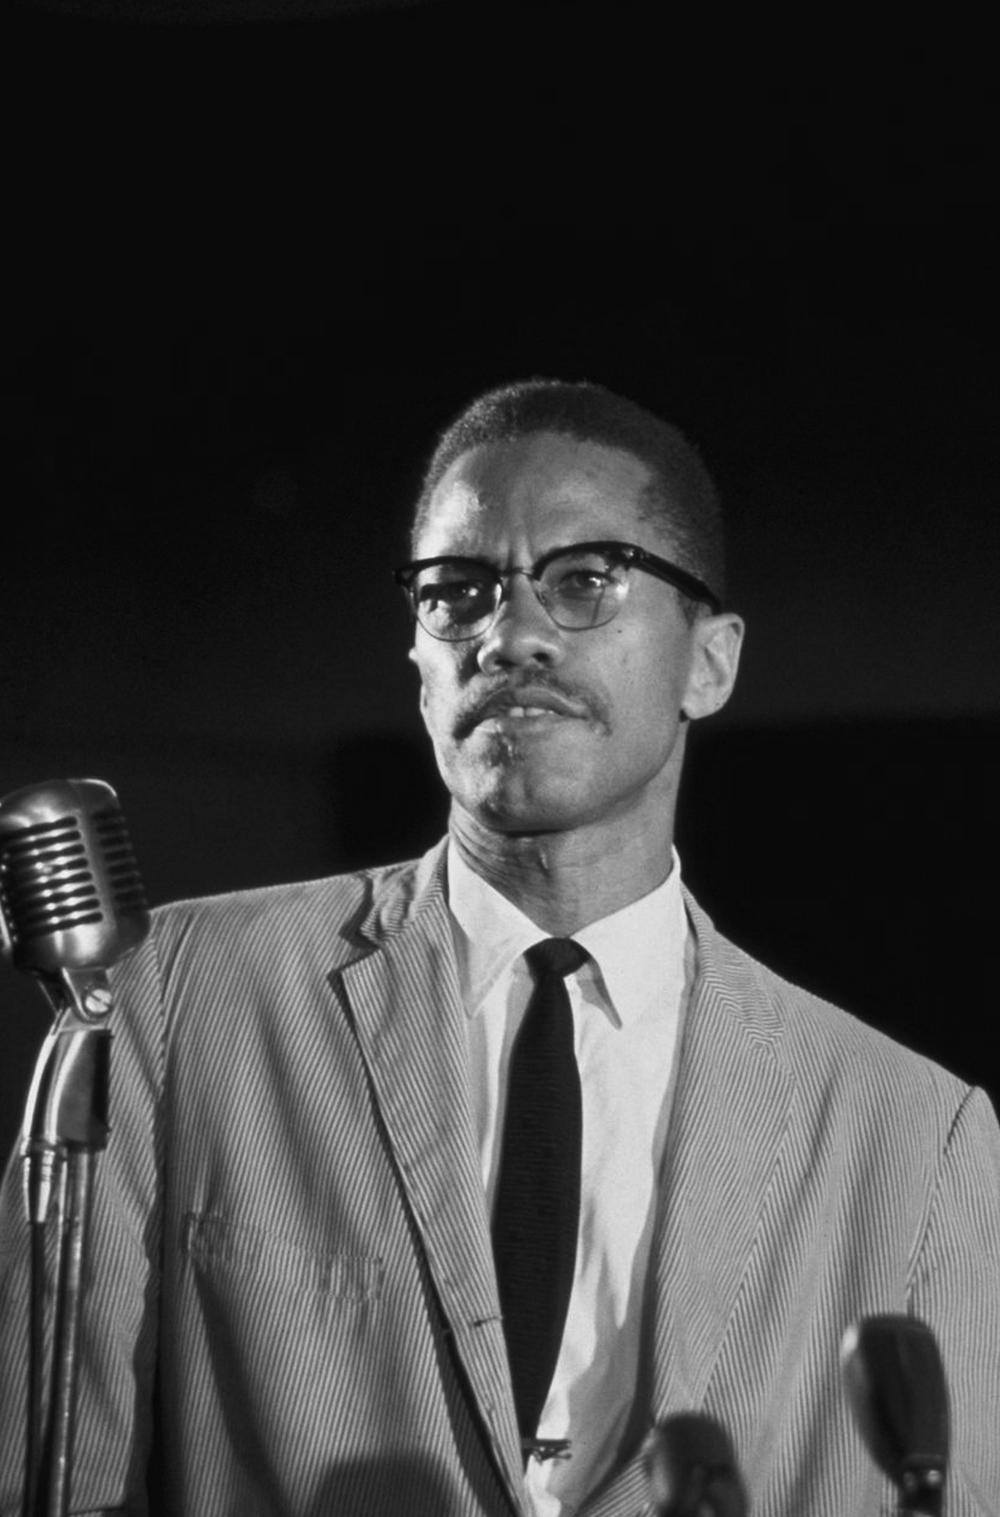 Malcom X, 1964